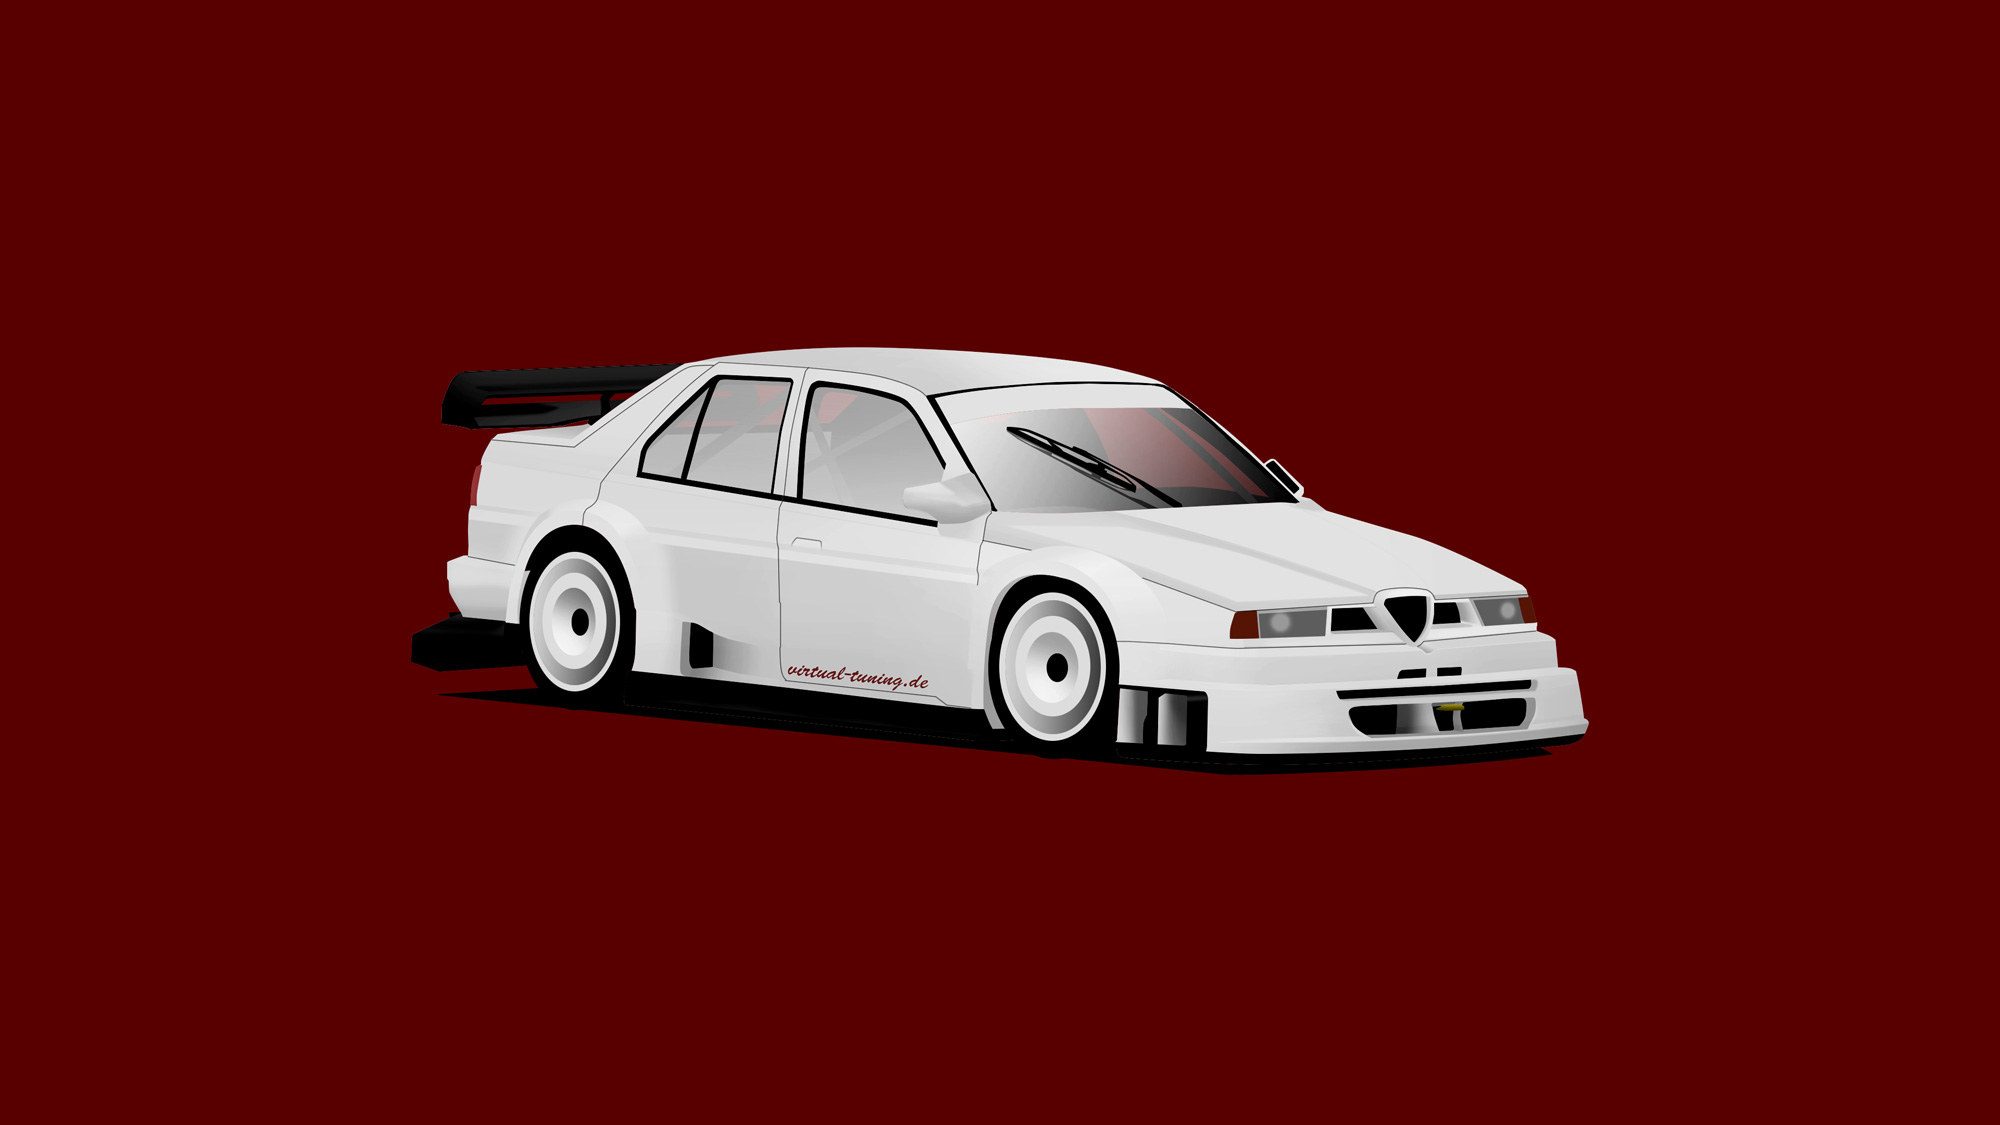 Alfa Romeo 155 V6 TI by virtual-tuning.de